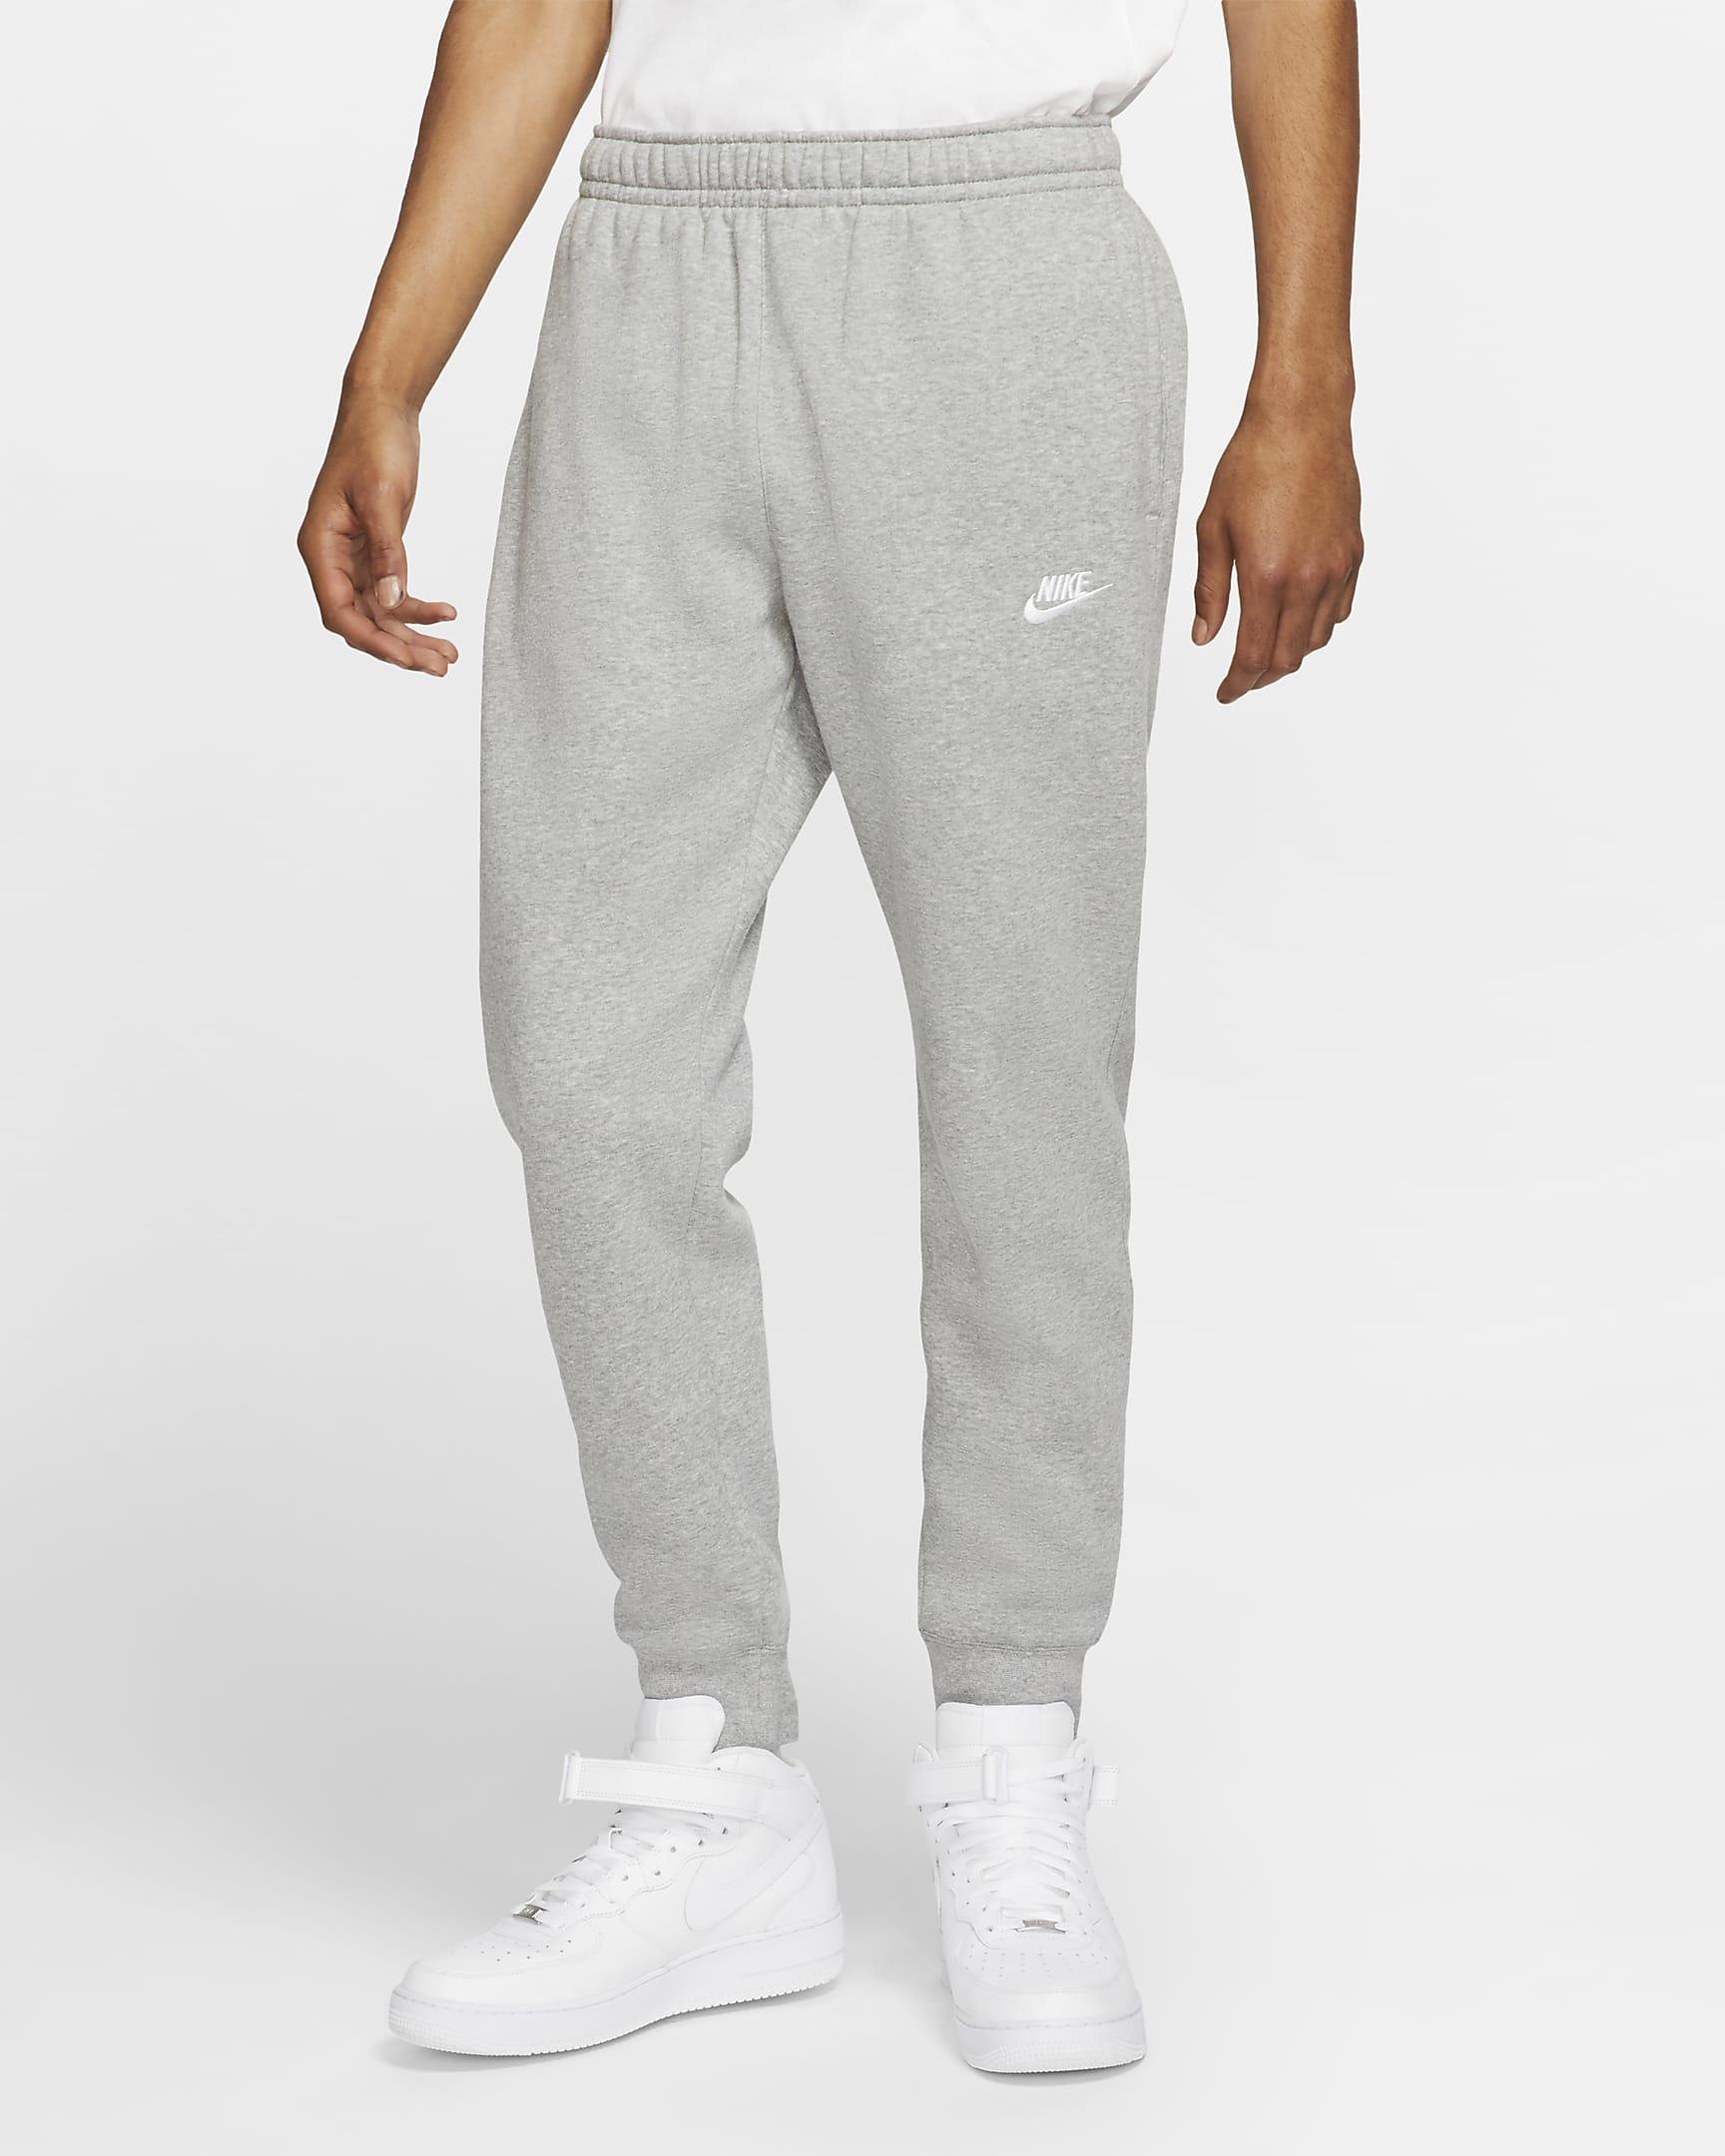 nike-sportswear-club-fleece-joggers-KflRdQ.png